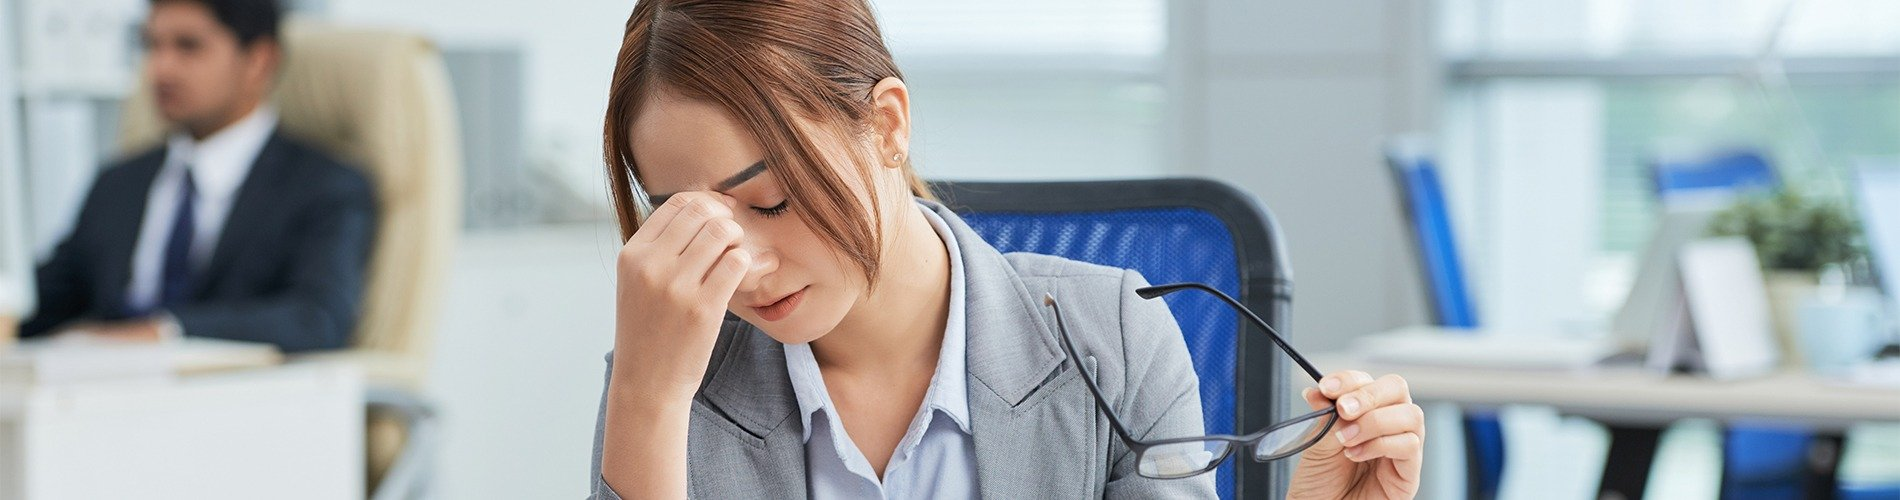 El estrés afecta nuestra salud bucodental